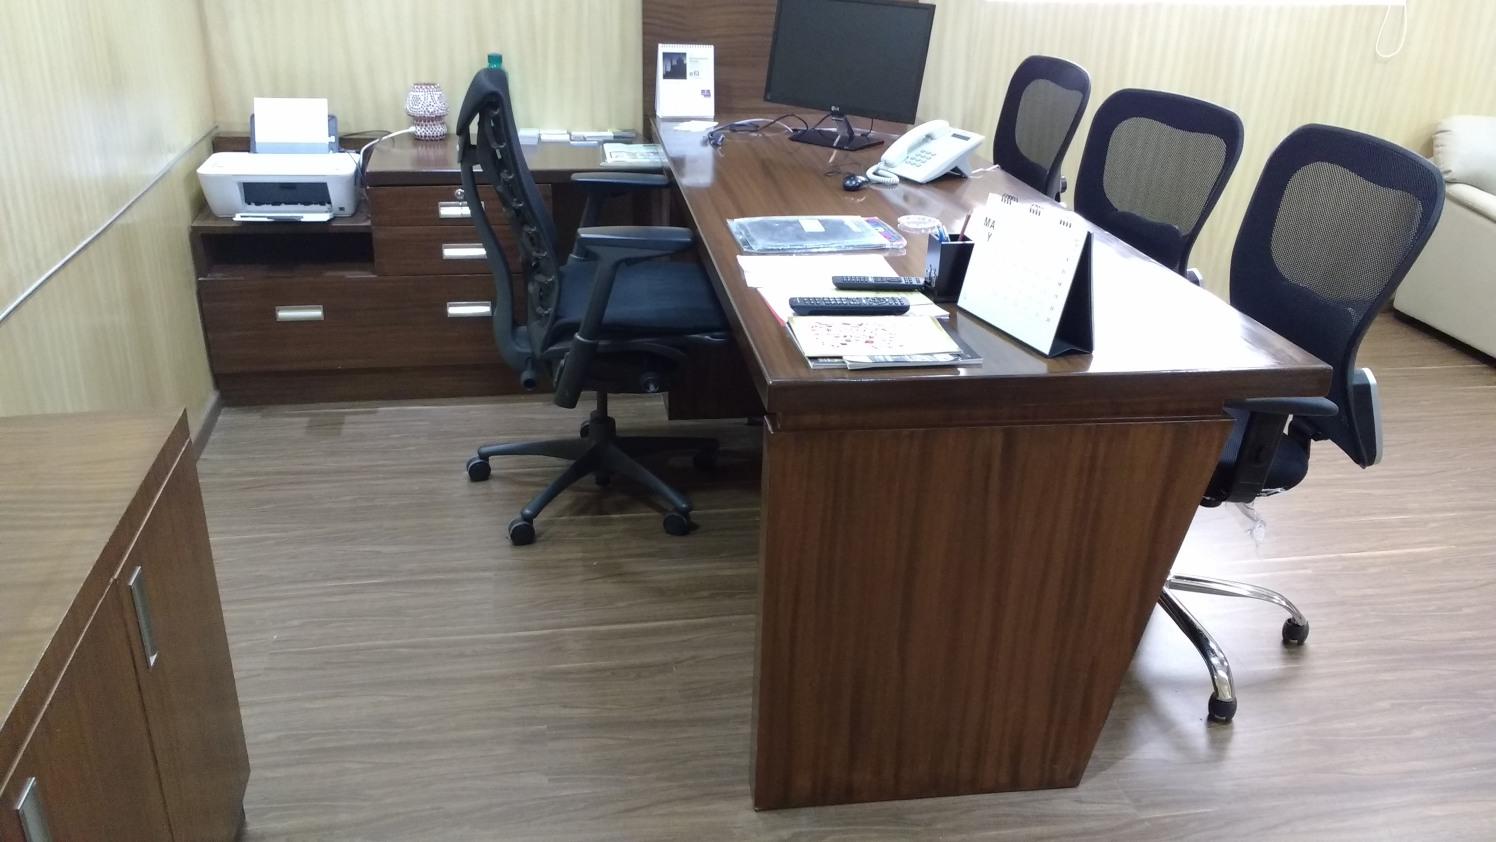 Simple office by Anirban Das